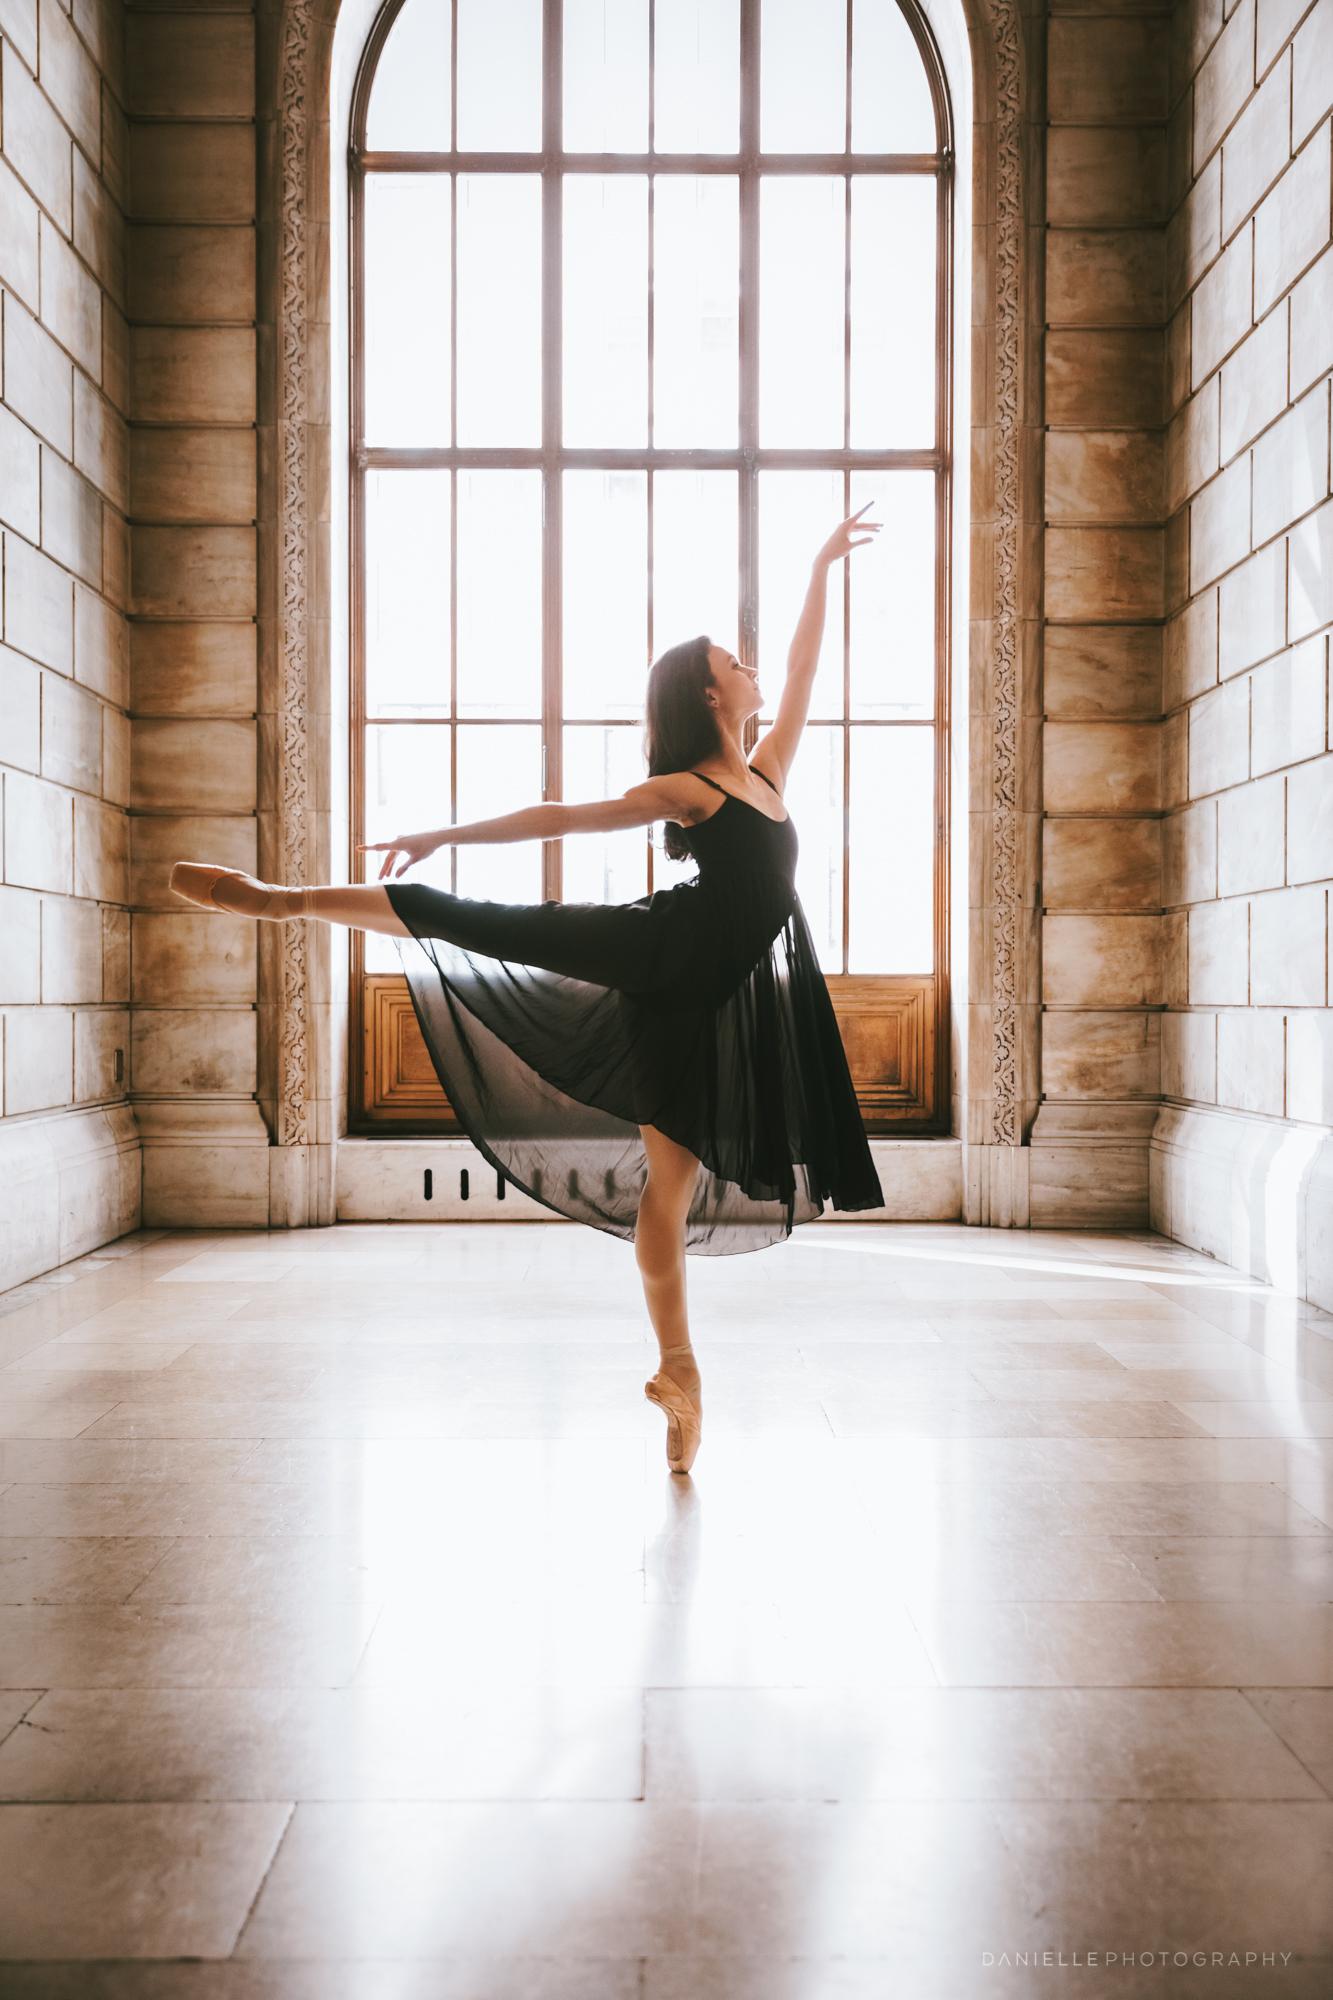 @DaniellePhotographySA_Ballerina_Photoshoot_NYPL-23-21.jpg